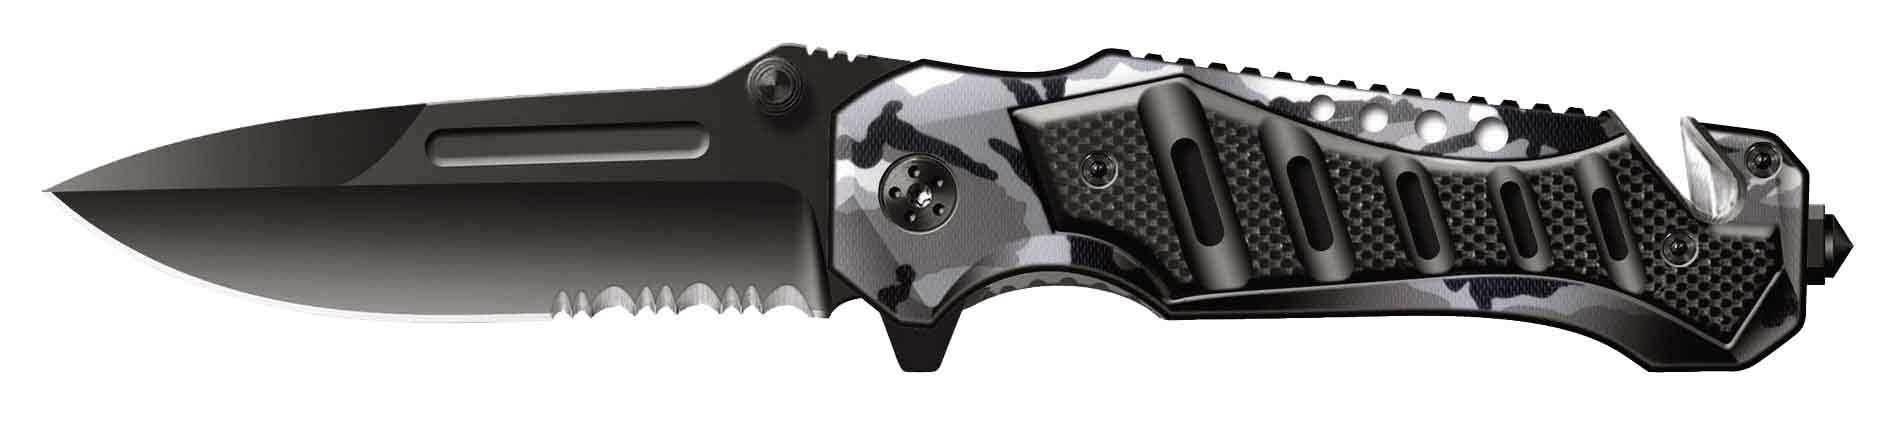 Нож складной Stinger SA-582DW, сталь 420, алюминий нож складной stinger sa 435b сталь 420 алюминий